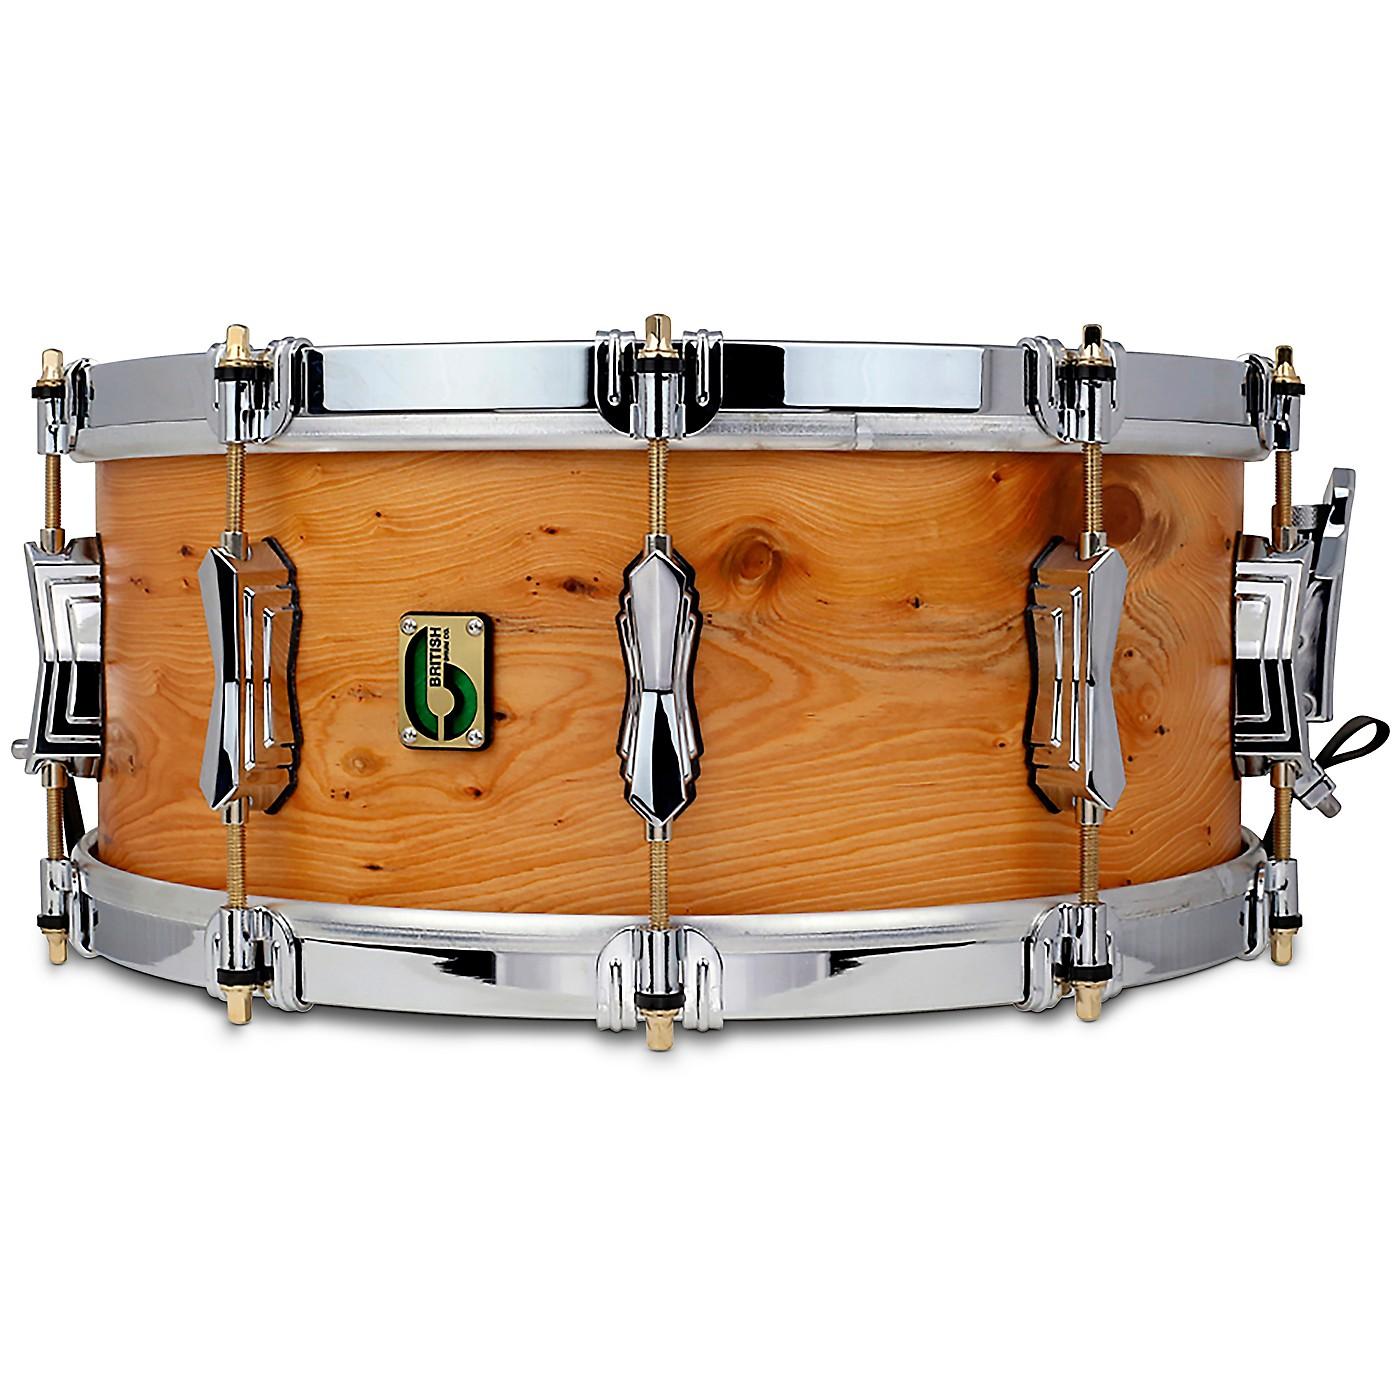 British Drum Co. Archer Snare Drum thumbnail